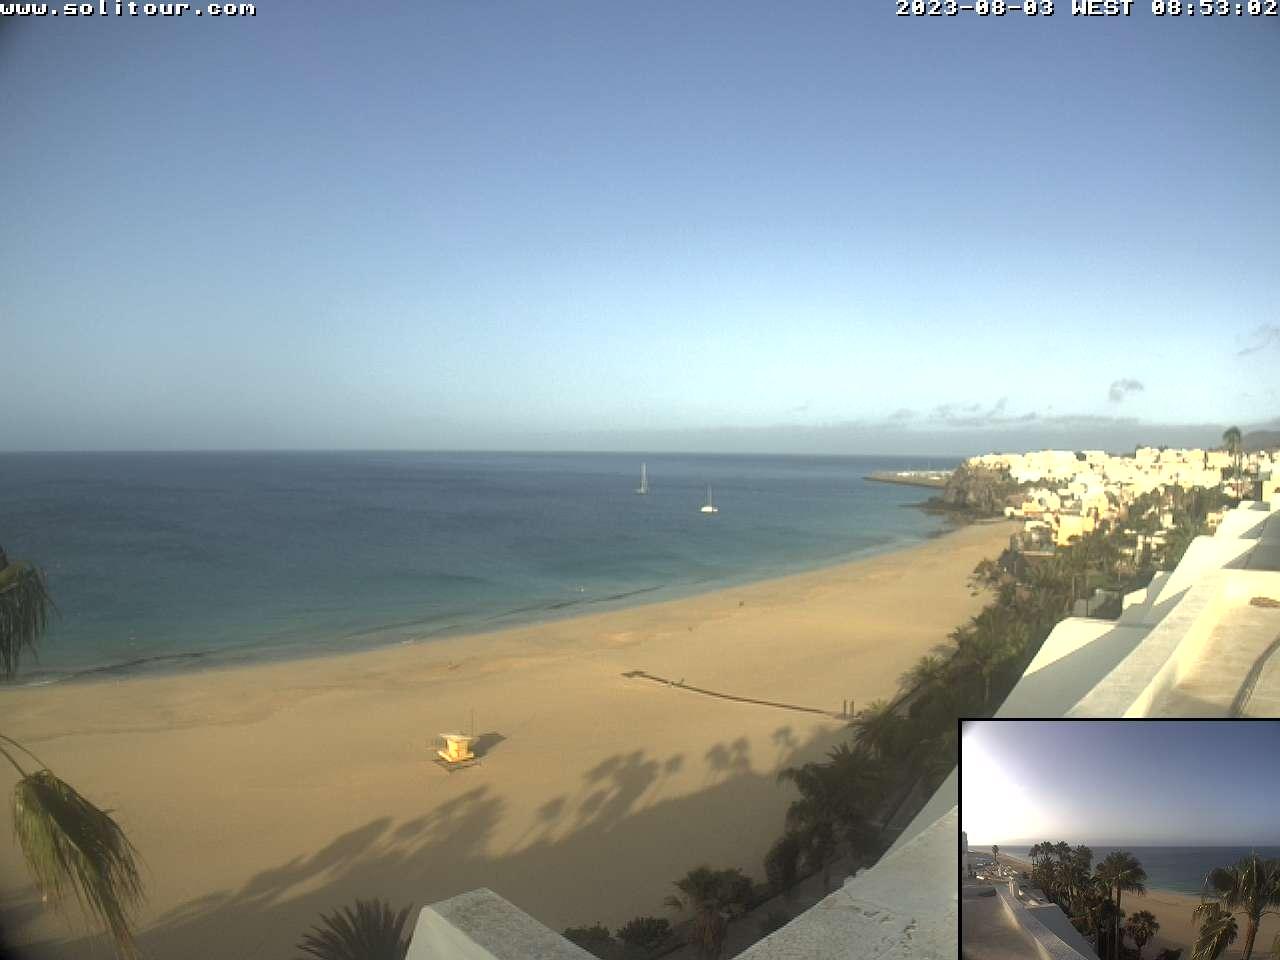 Jandia (Fuerteventura) Fri. 08:53